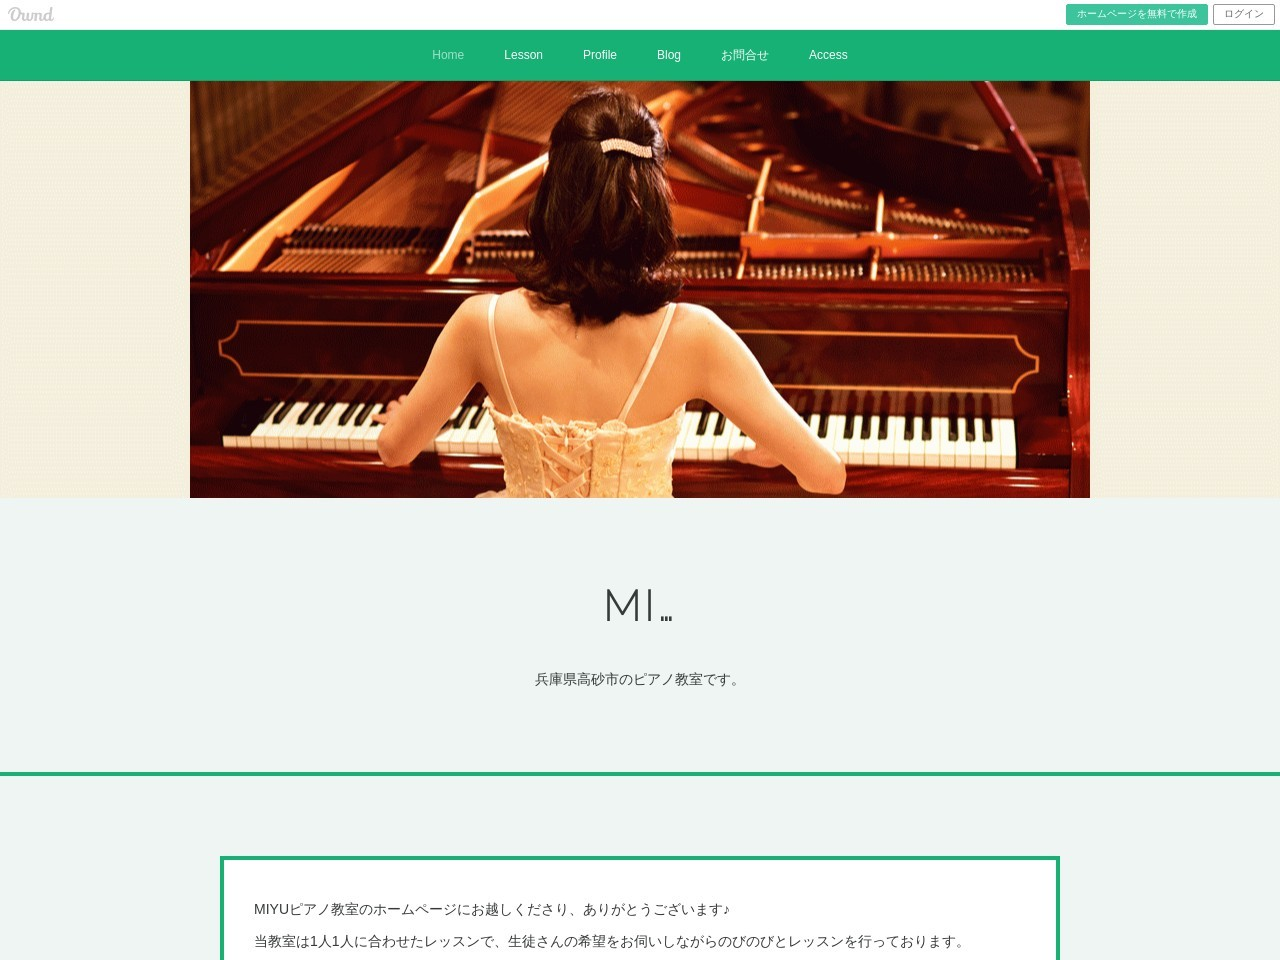 MIYUピアノ教室のサムネイル